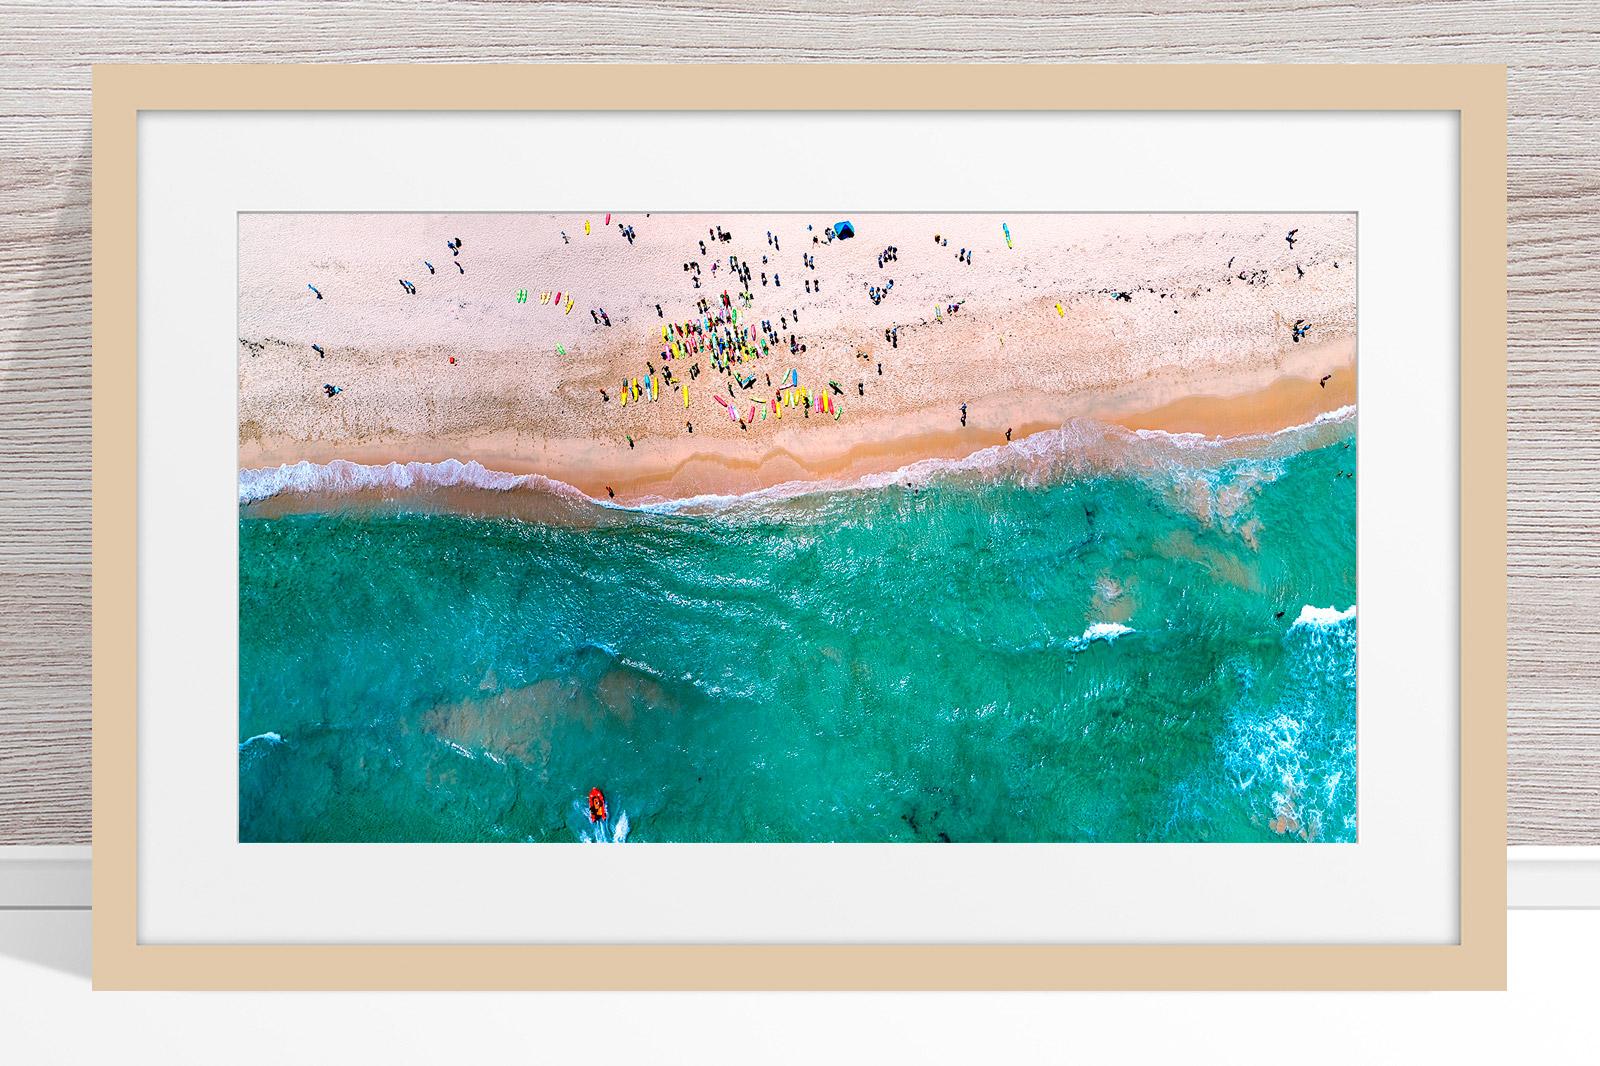 093 - Jason Mazur - 'Trigg Beach Surf Carnival' Light Frame